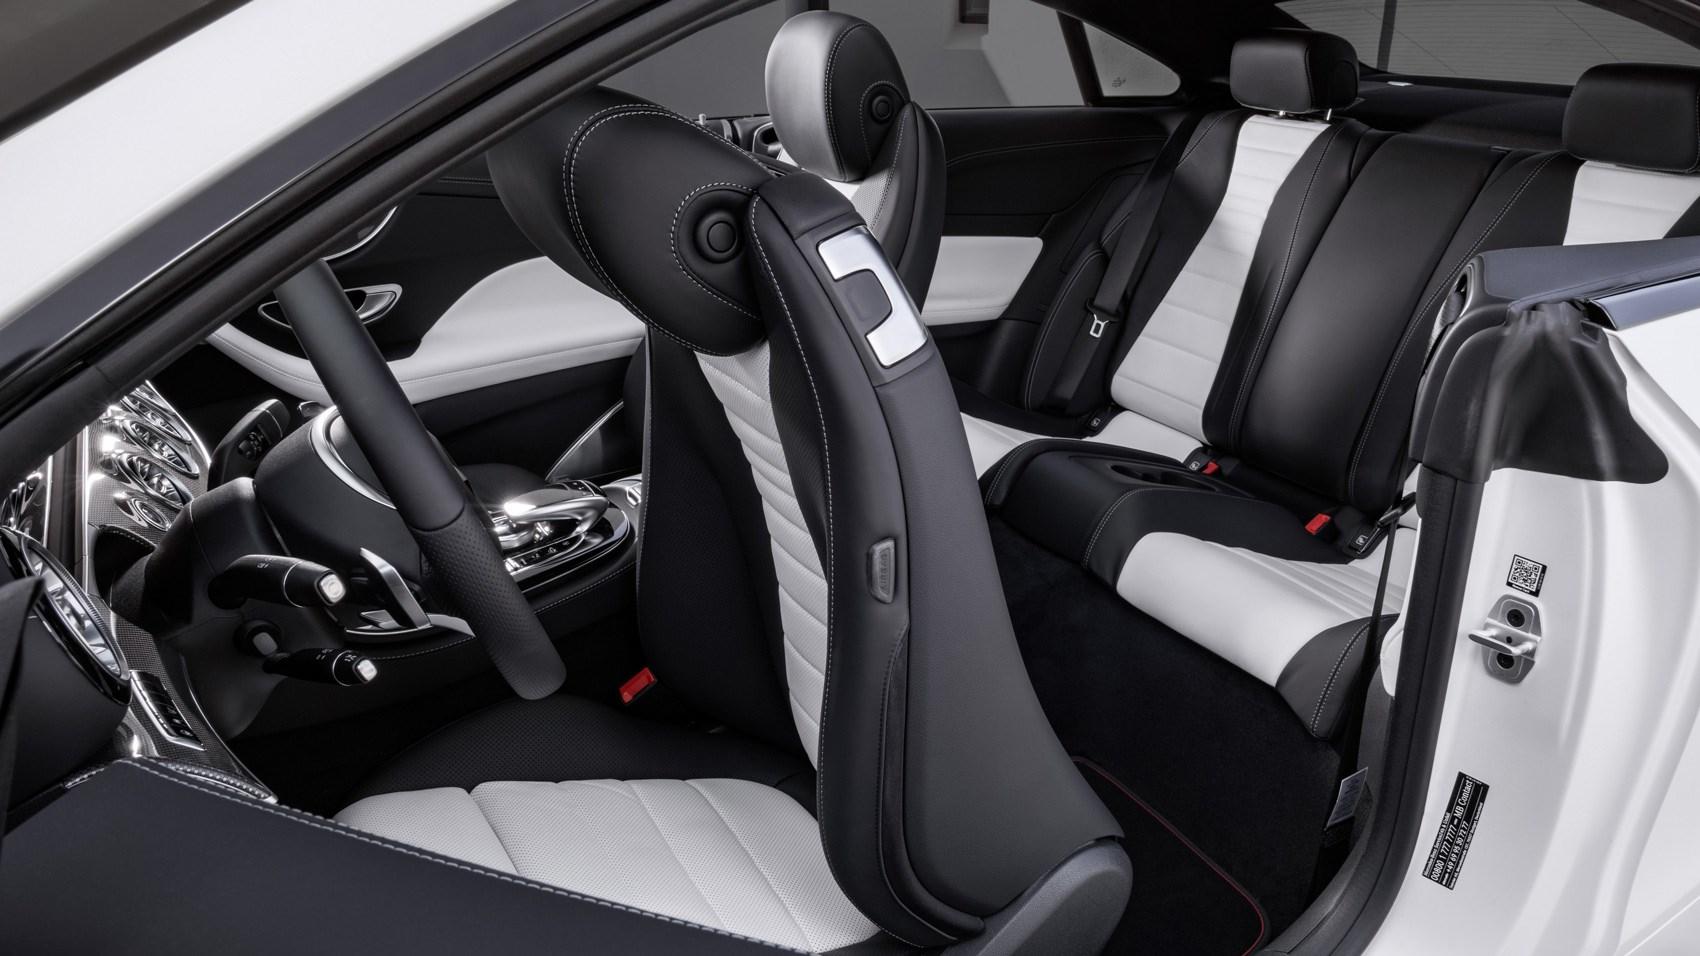 mercedes e220d coupe (2017) reviewcar magazine